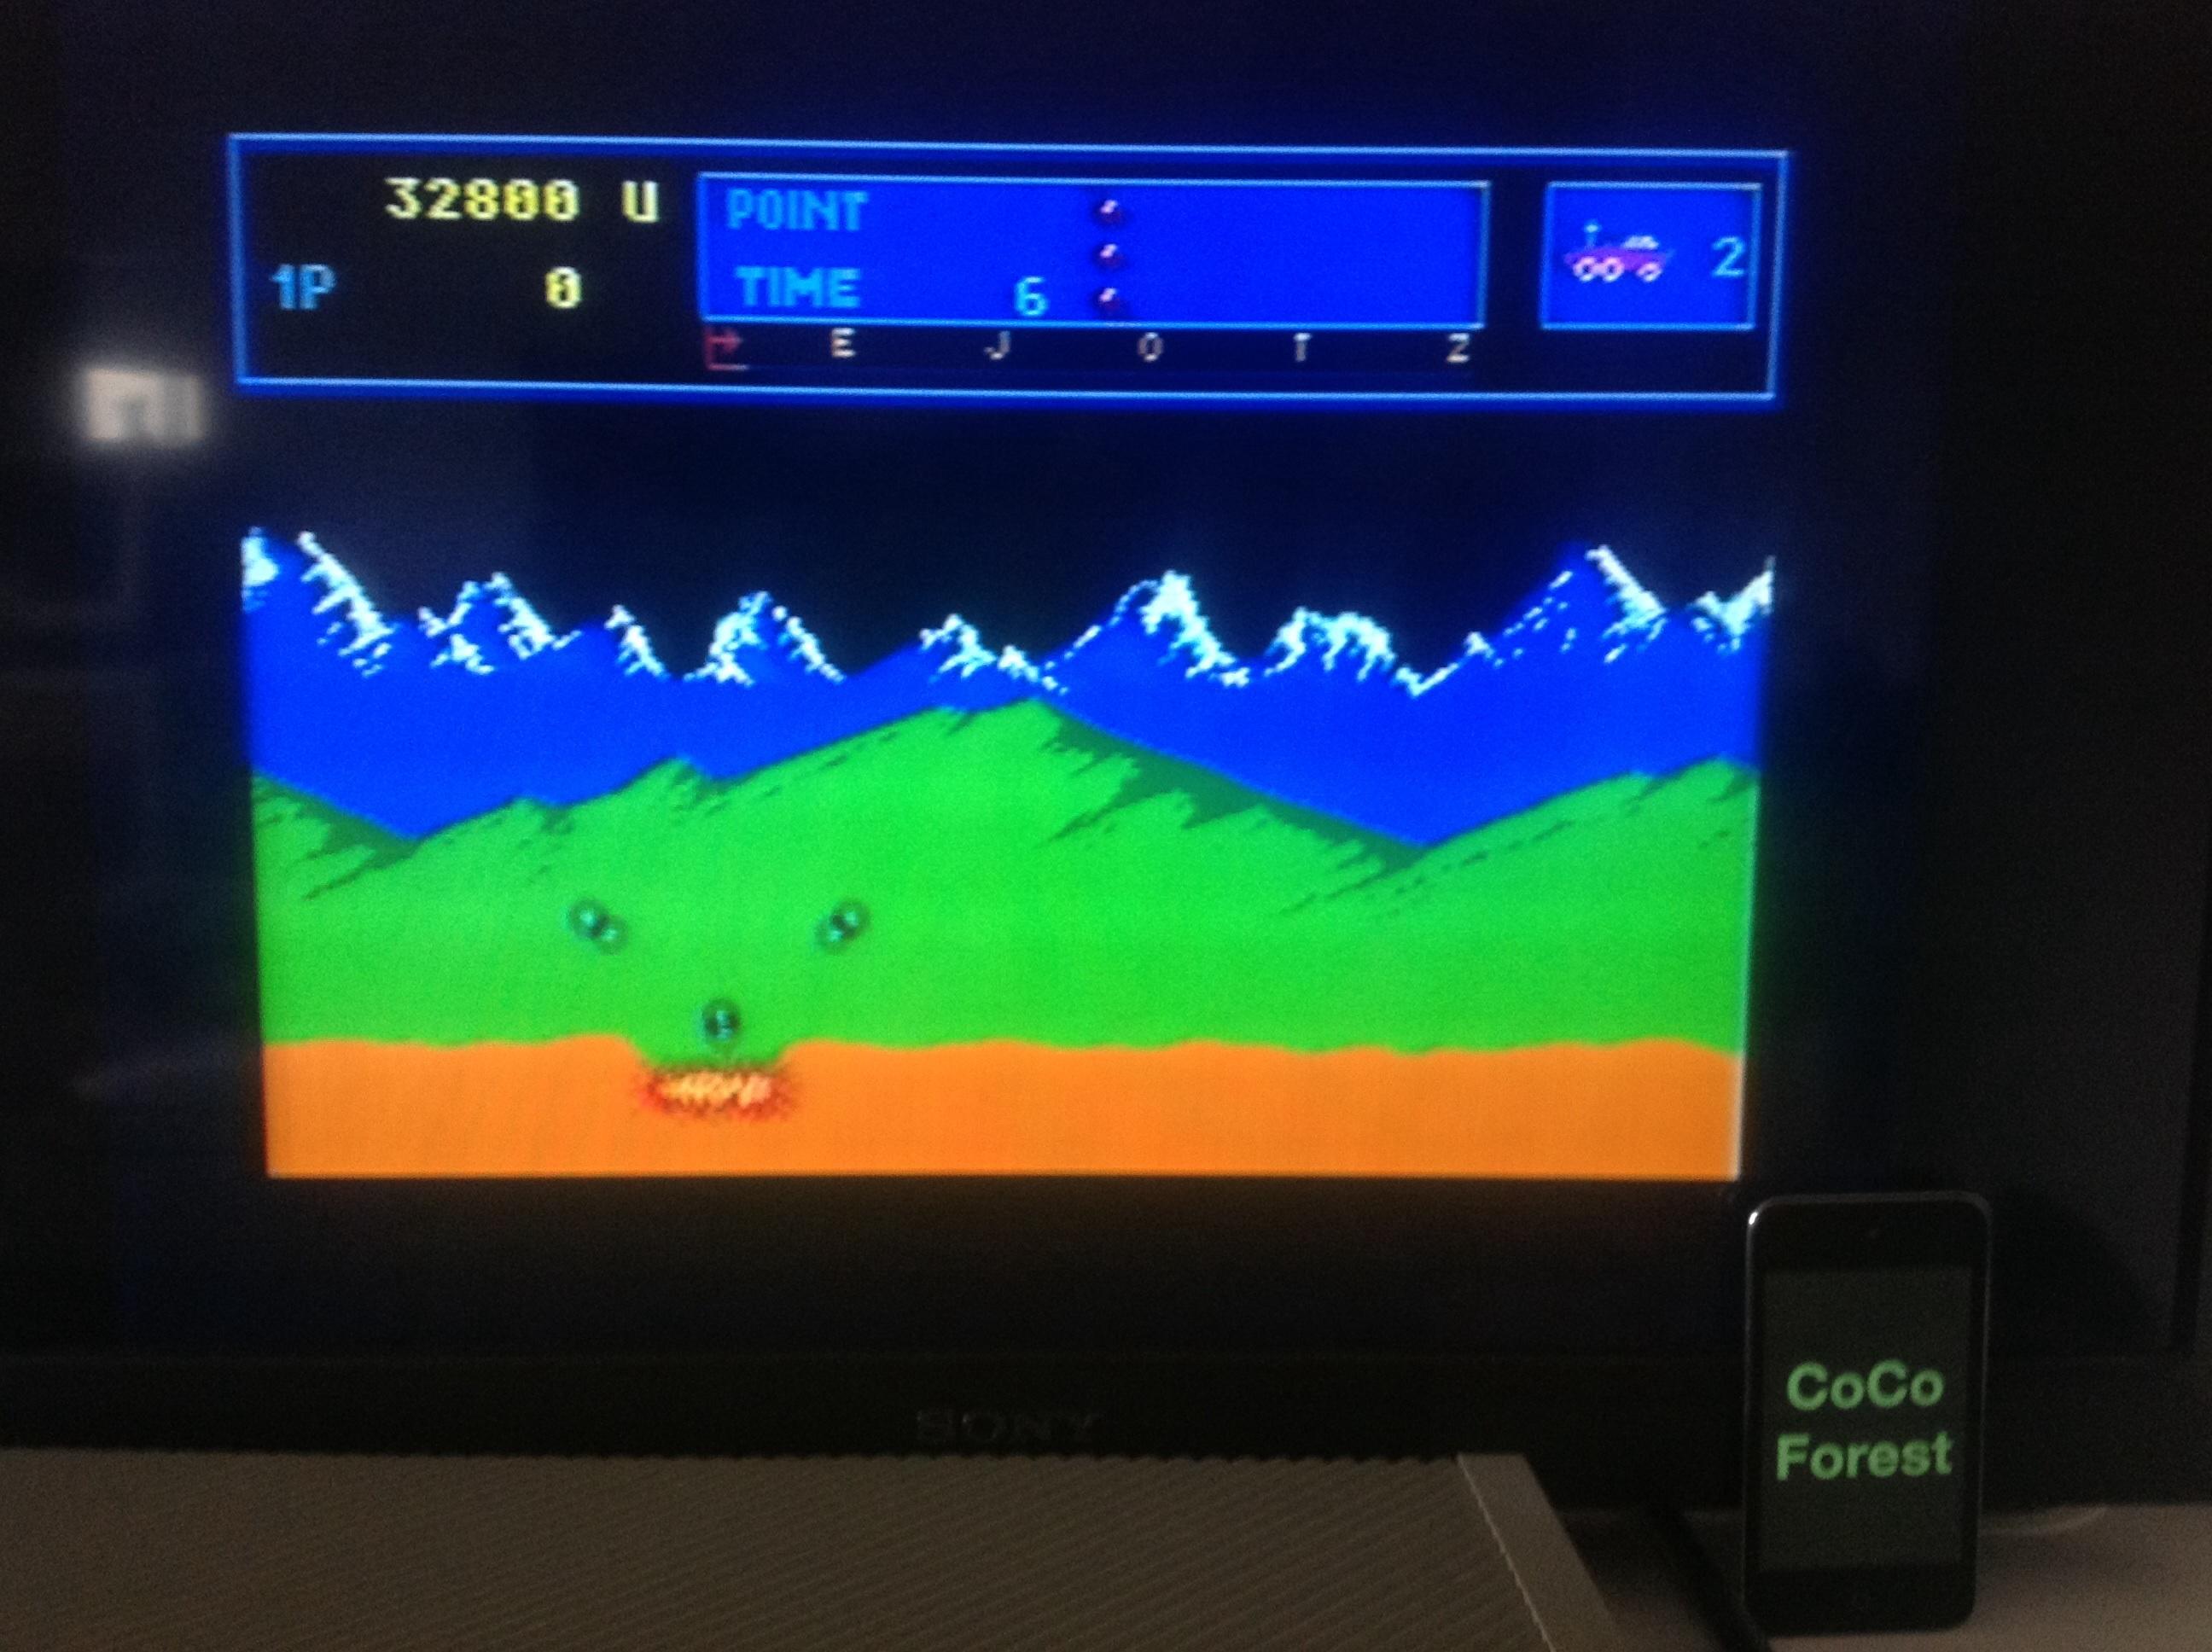 CoCoForest: Moon Patrol (Atari ST) 32,800 points on 2014-05-23 08:13:22